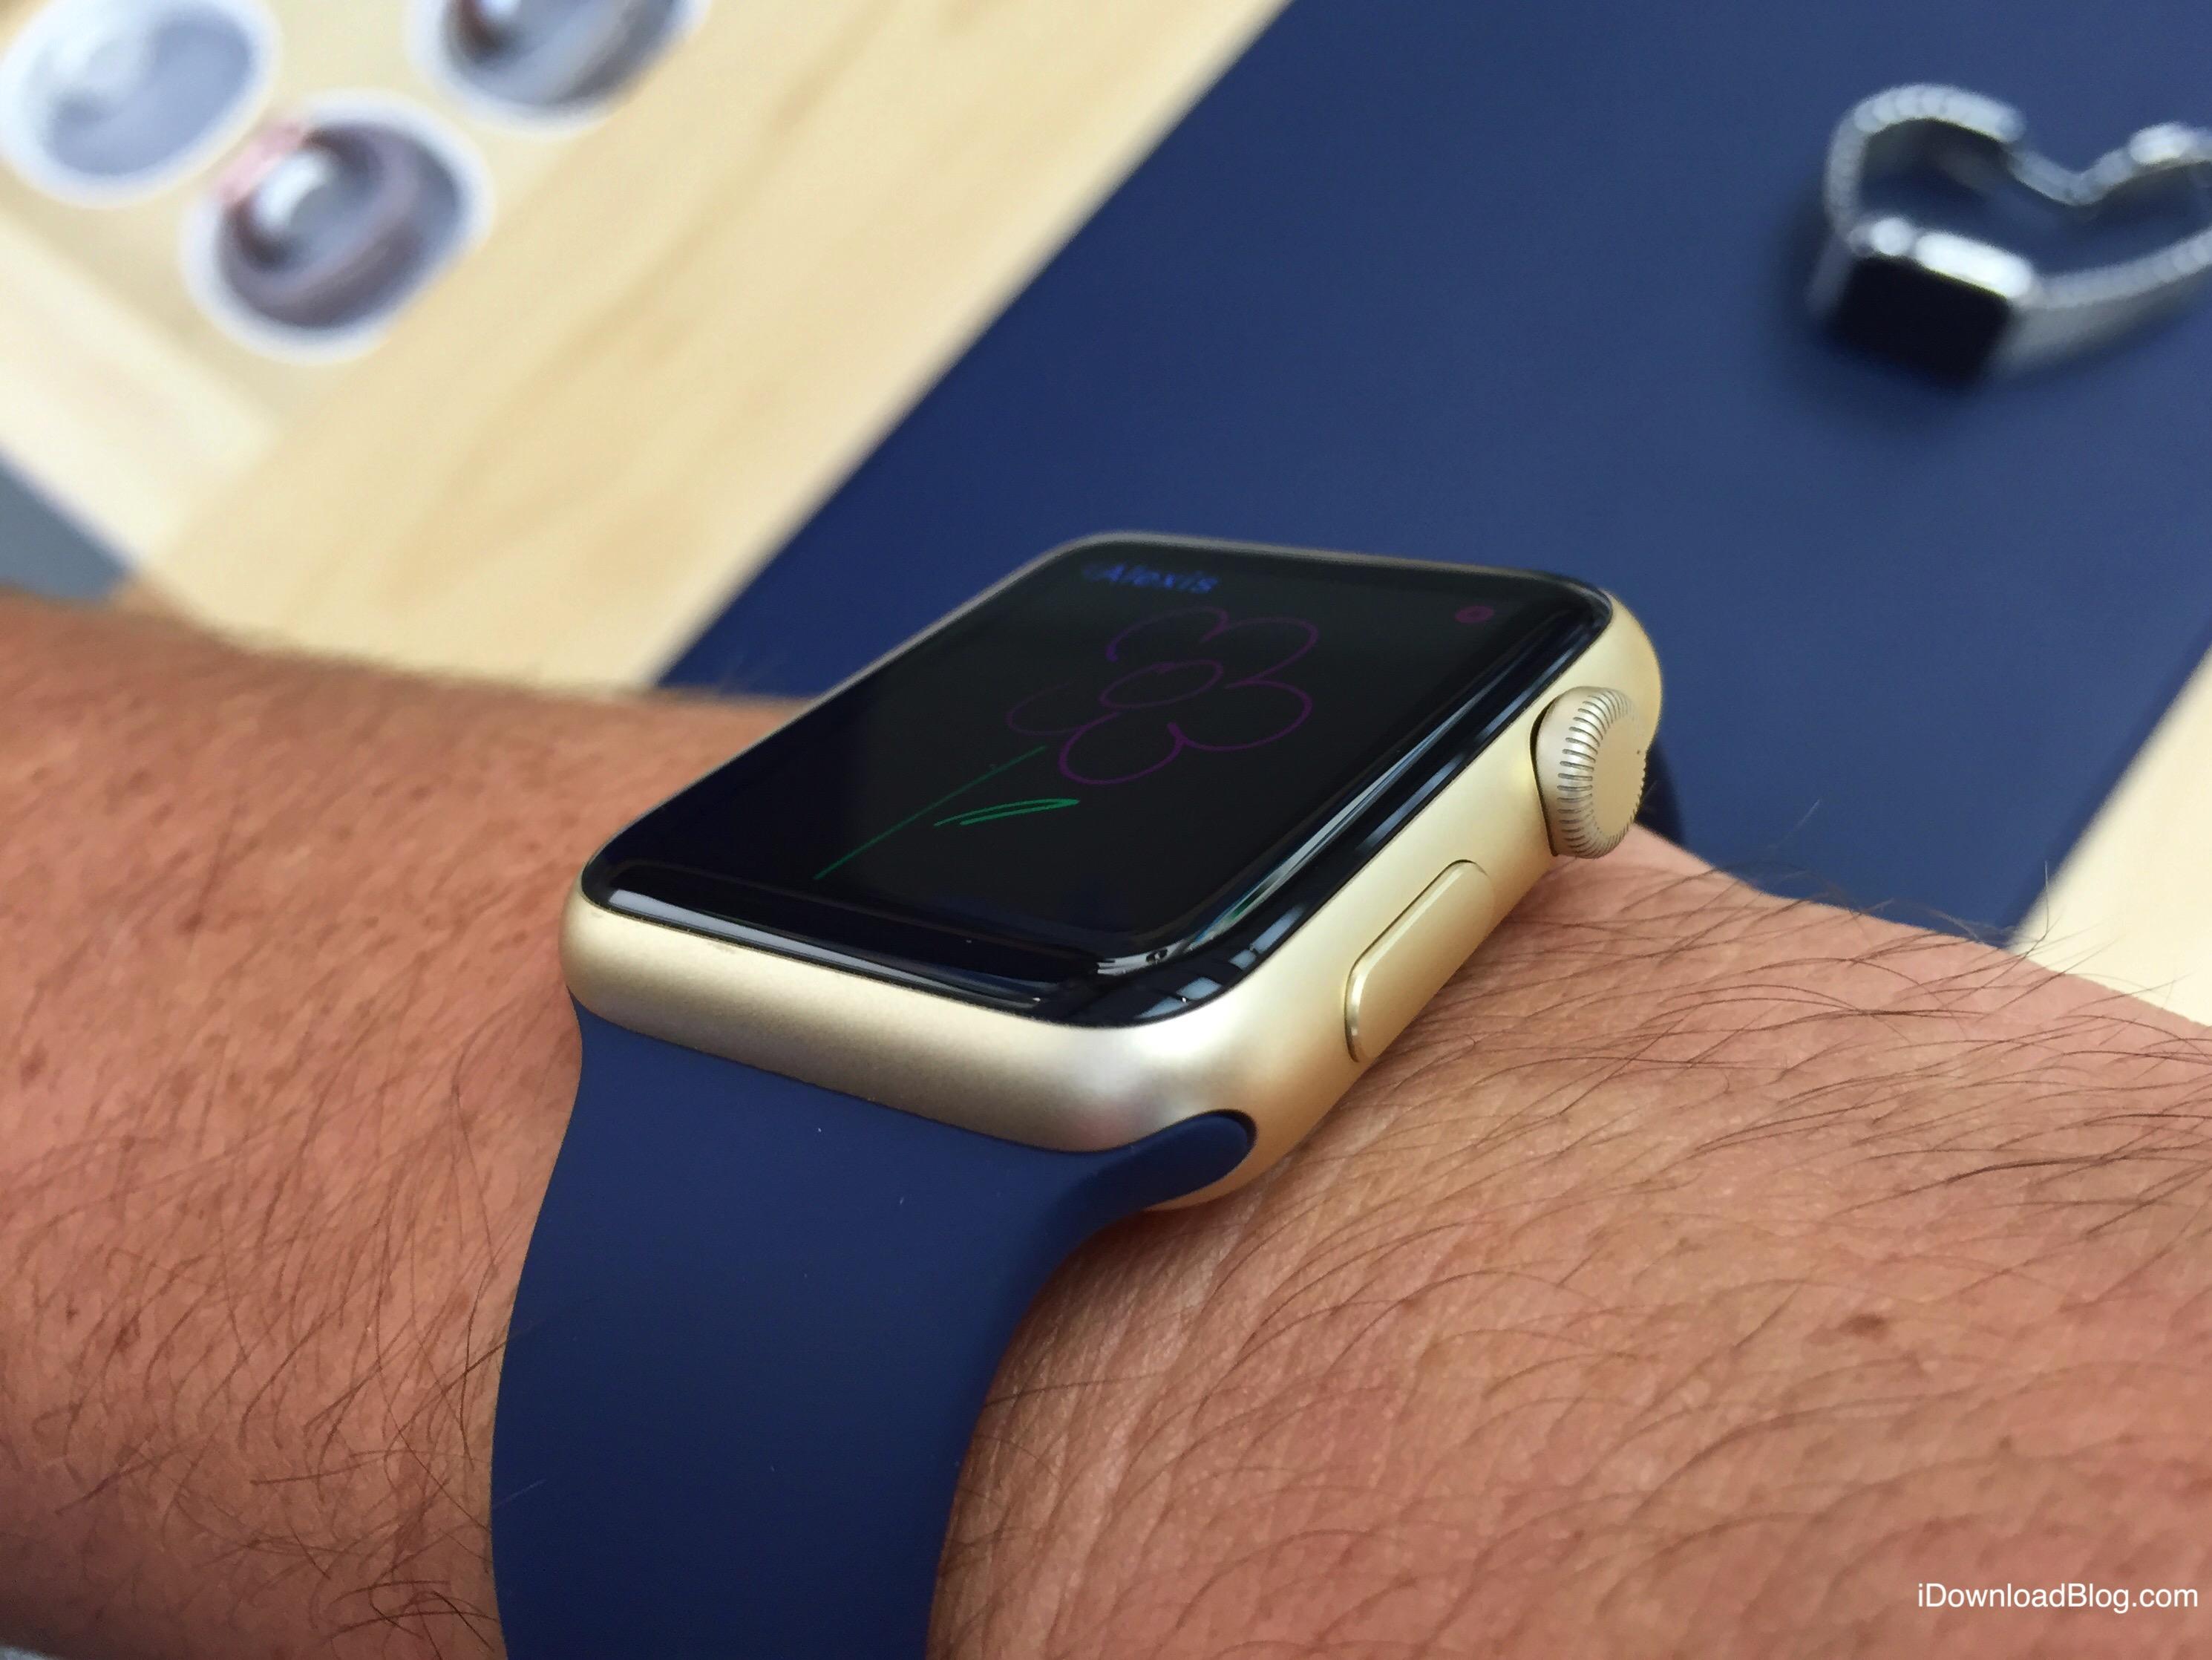 Gold Aluminum Apple Watch Hands on 5